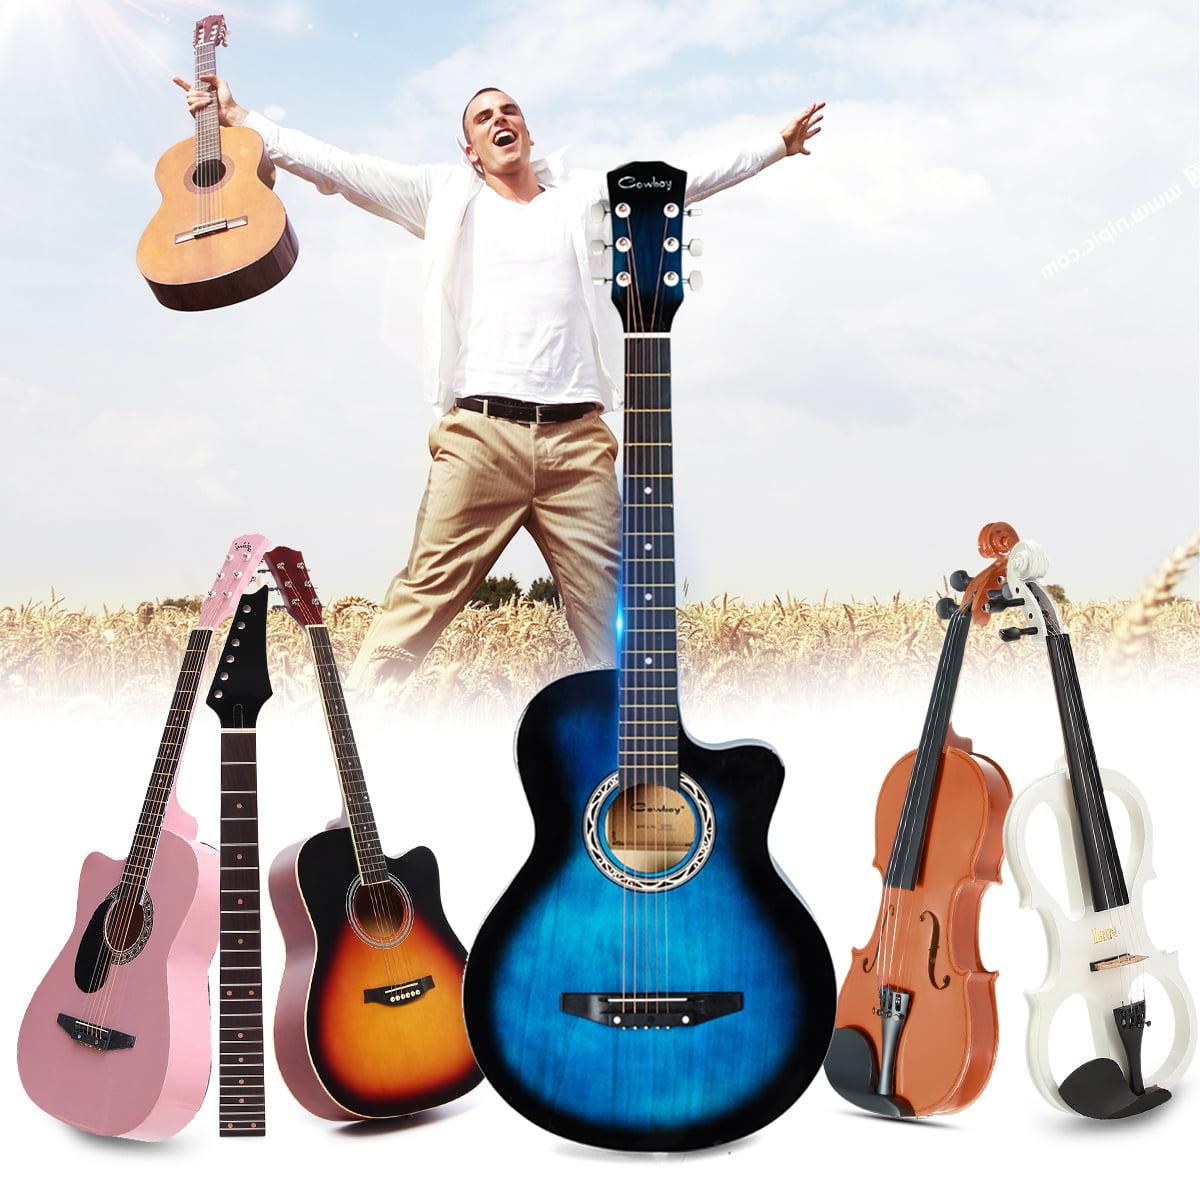 38 6 string folk acoustic guitar basswood with bag for beginners musical instruments music. Black Bedroom Furniture Sets. Home Design Ideas